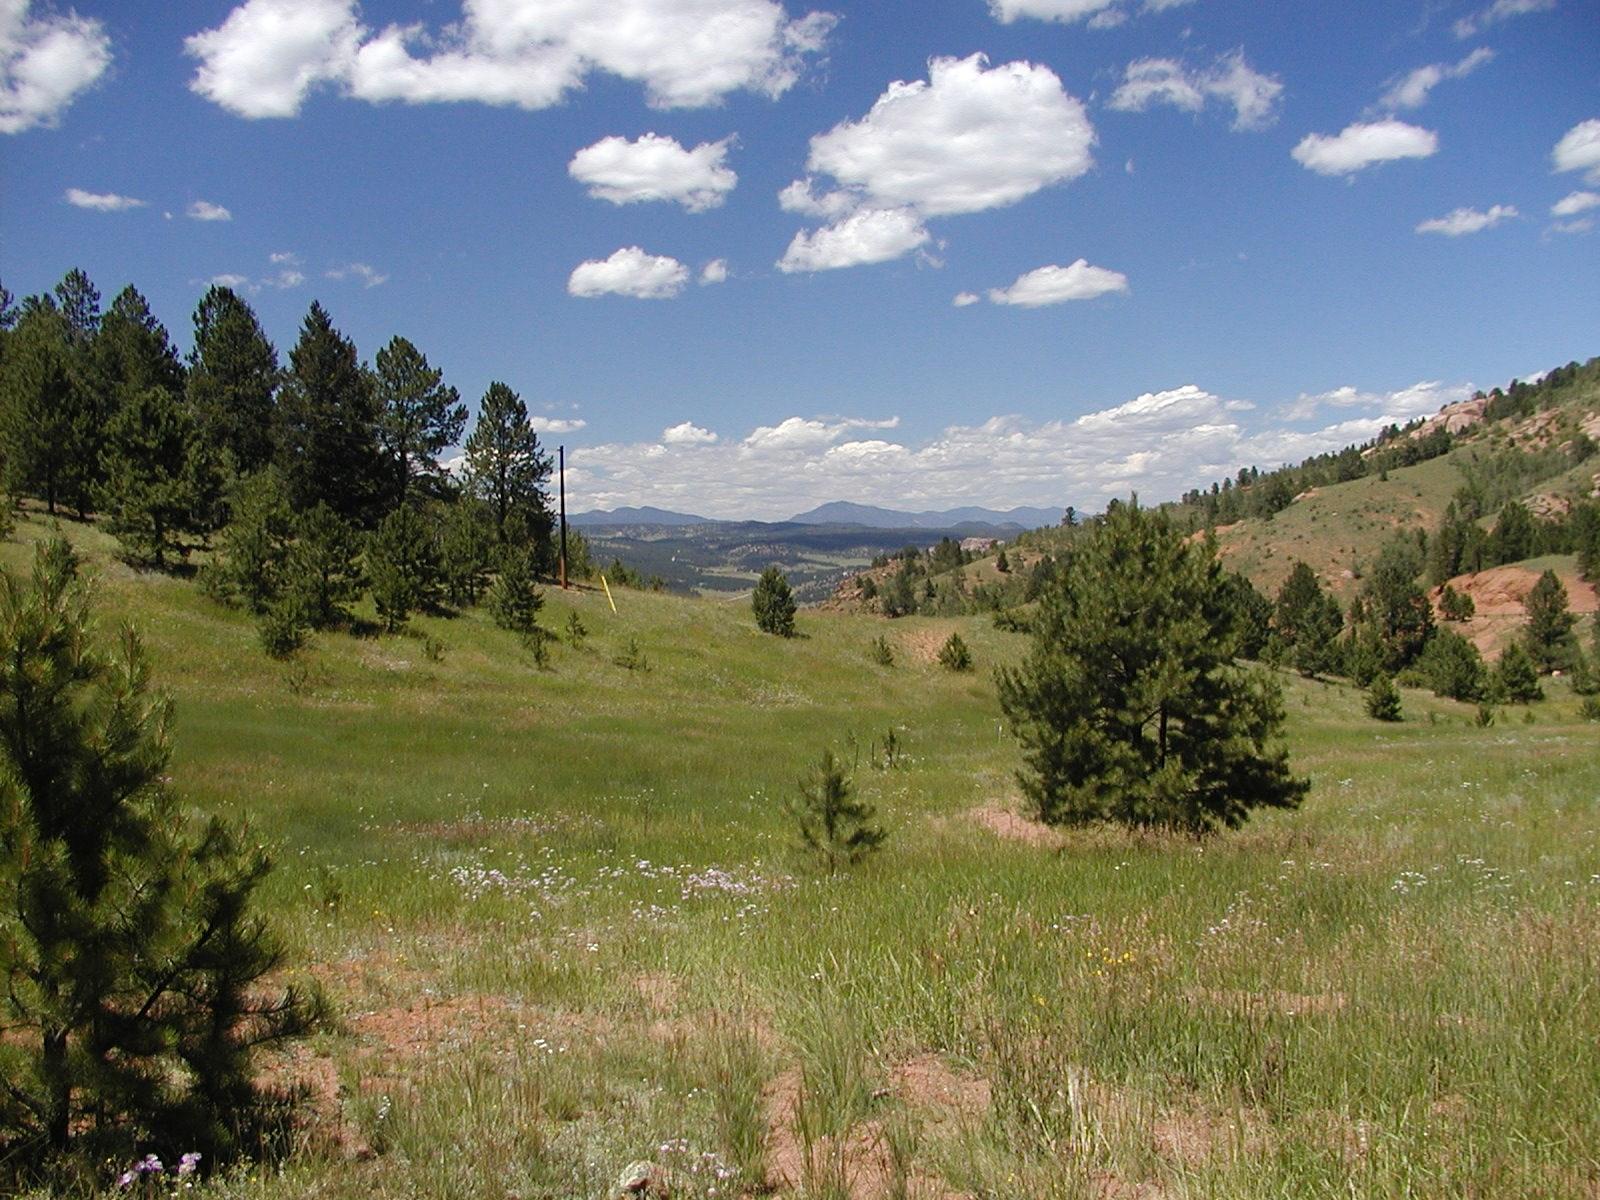 40 ACRES NEAR CRIPPLE CREEK COLORADO WITH POND & COUNTY ROAD